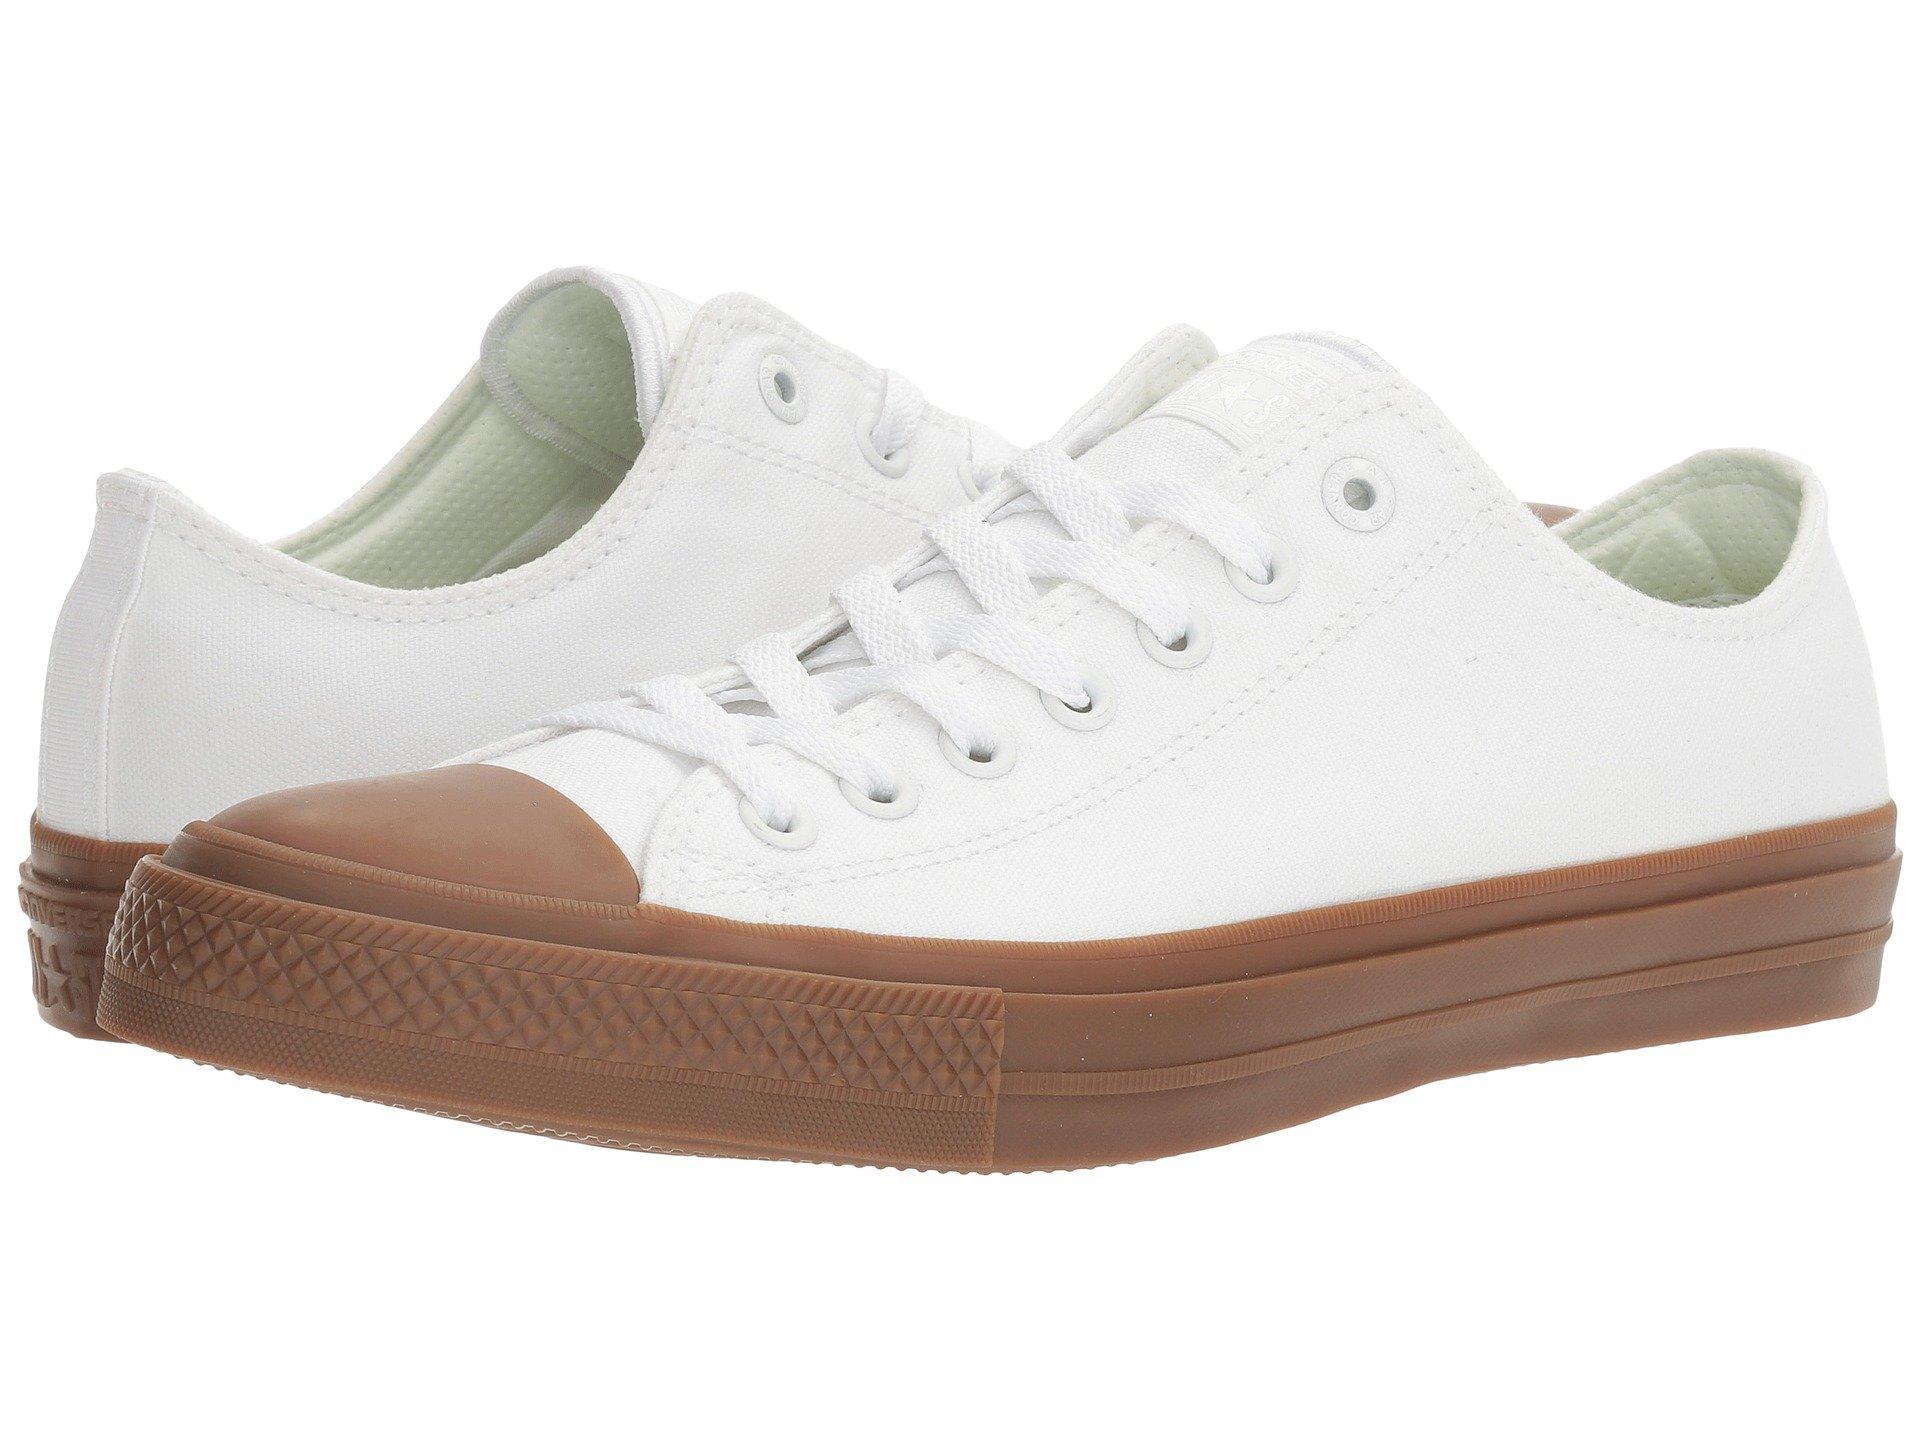 Converse Chuck Taylor® All Star® Ii Gum Ox In White/white/gum ...